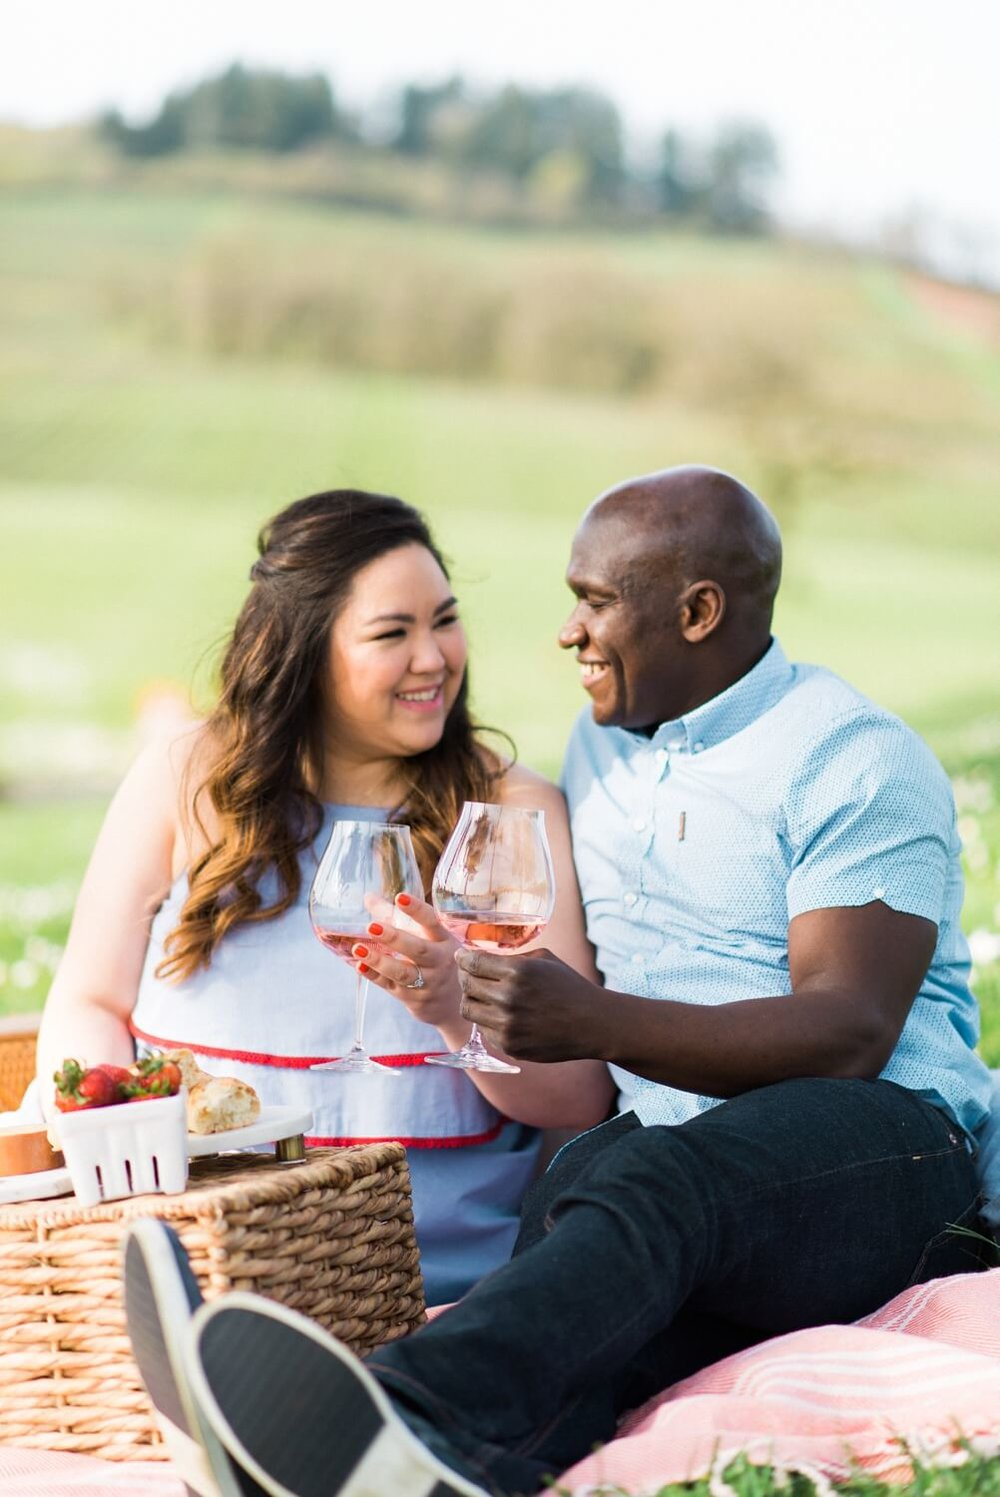 portland-vineyard-engagement-photos-daniel-andrea-043_cr.jpg